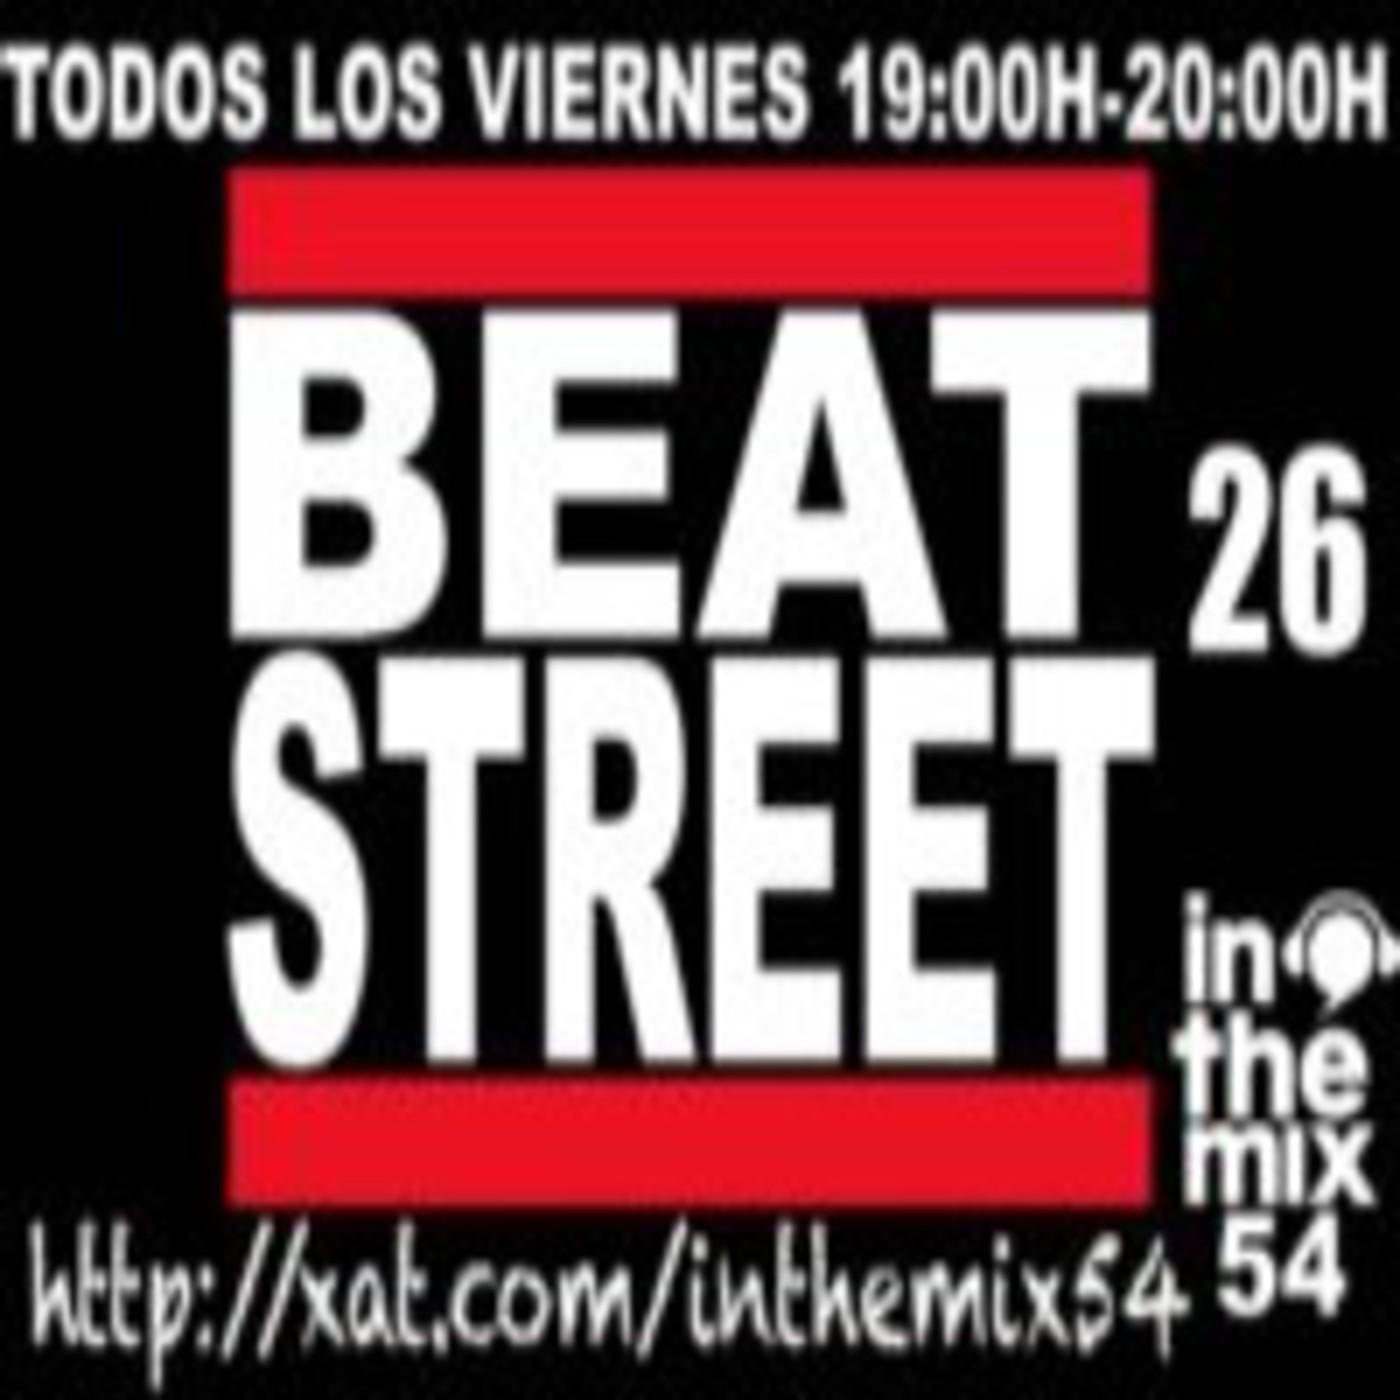 DJ SPY-Beat Street Nº26 (In The Mix 54 Radio)